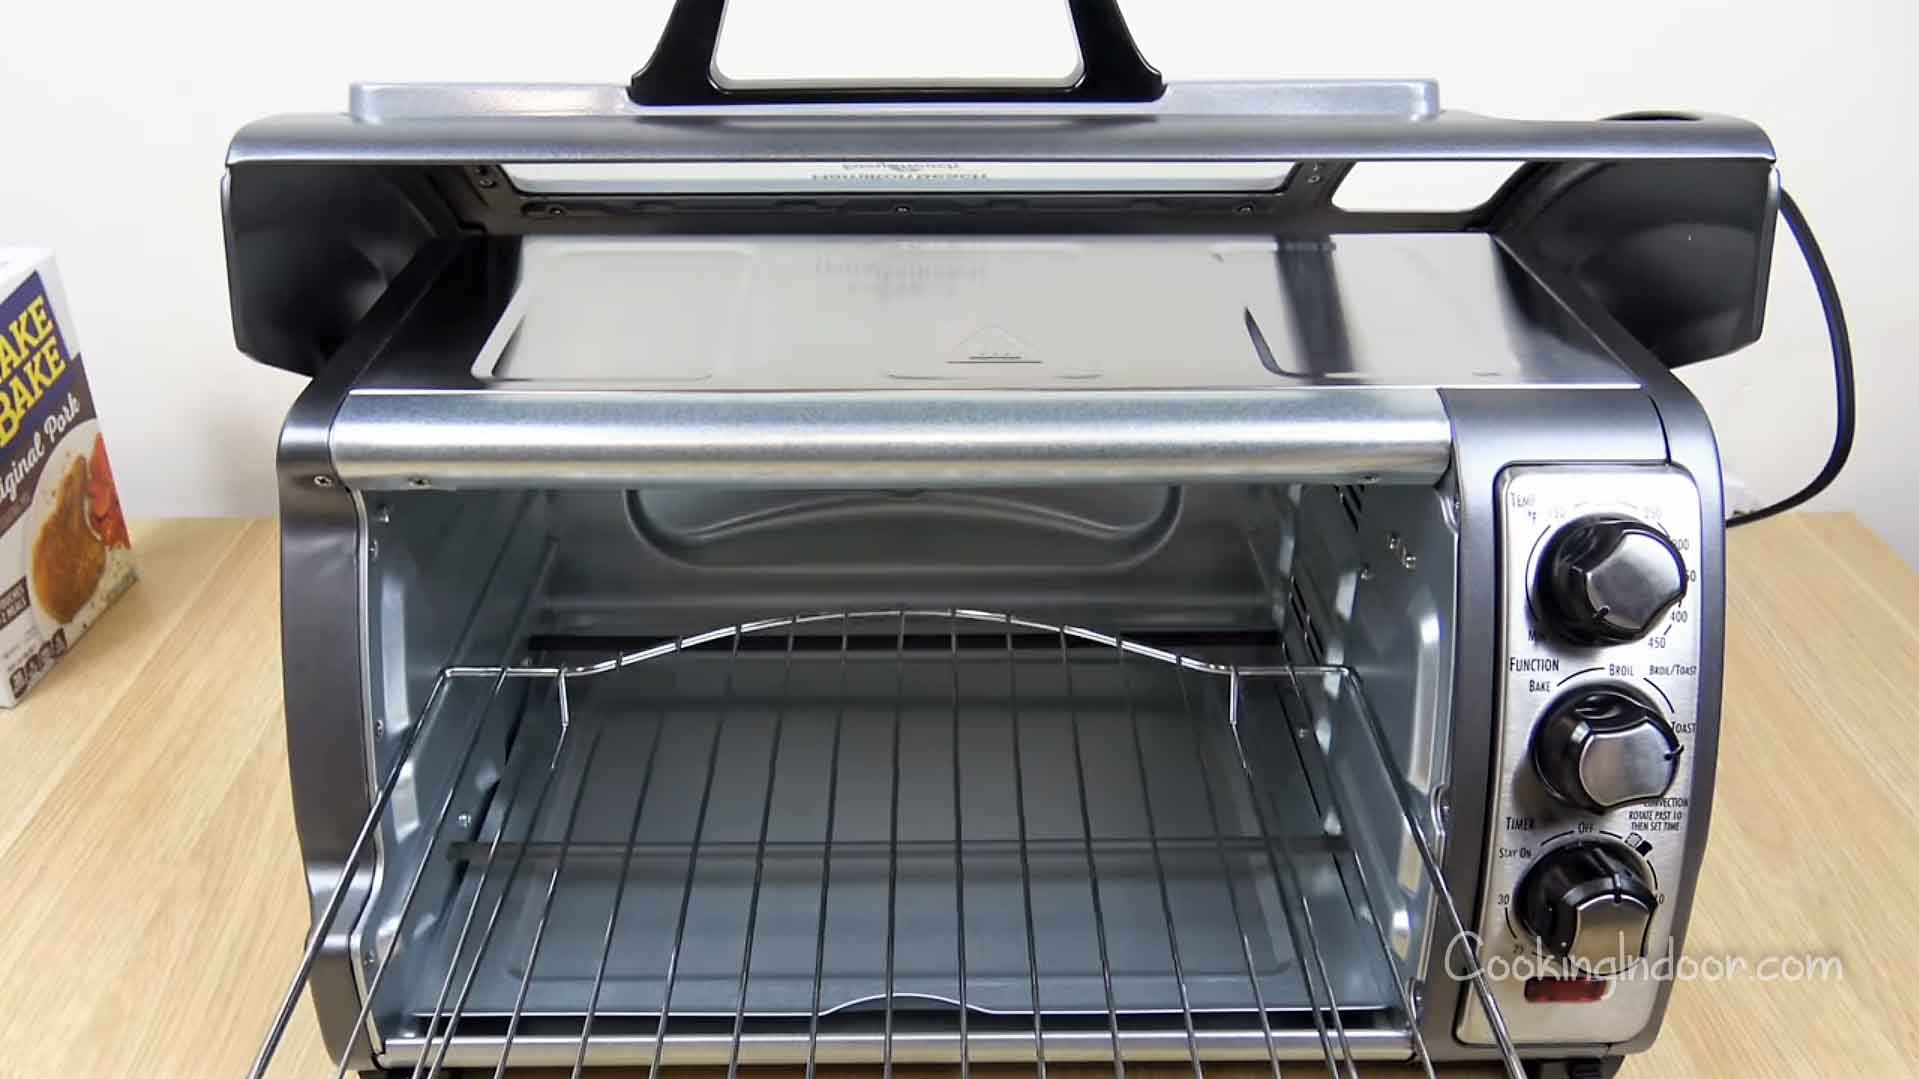 Best big toaster oven